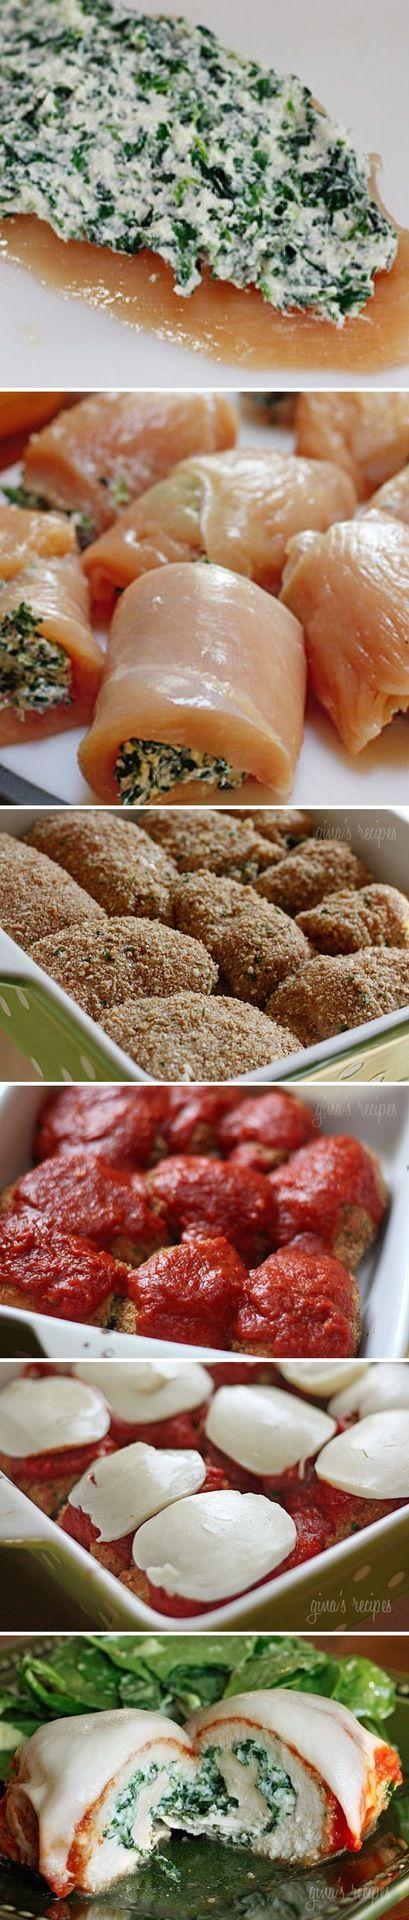 Chicken Rollatini with Spinach alla Parmigiana - Erin Easy Recipes